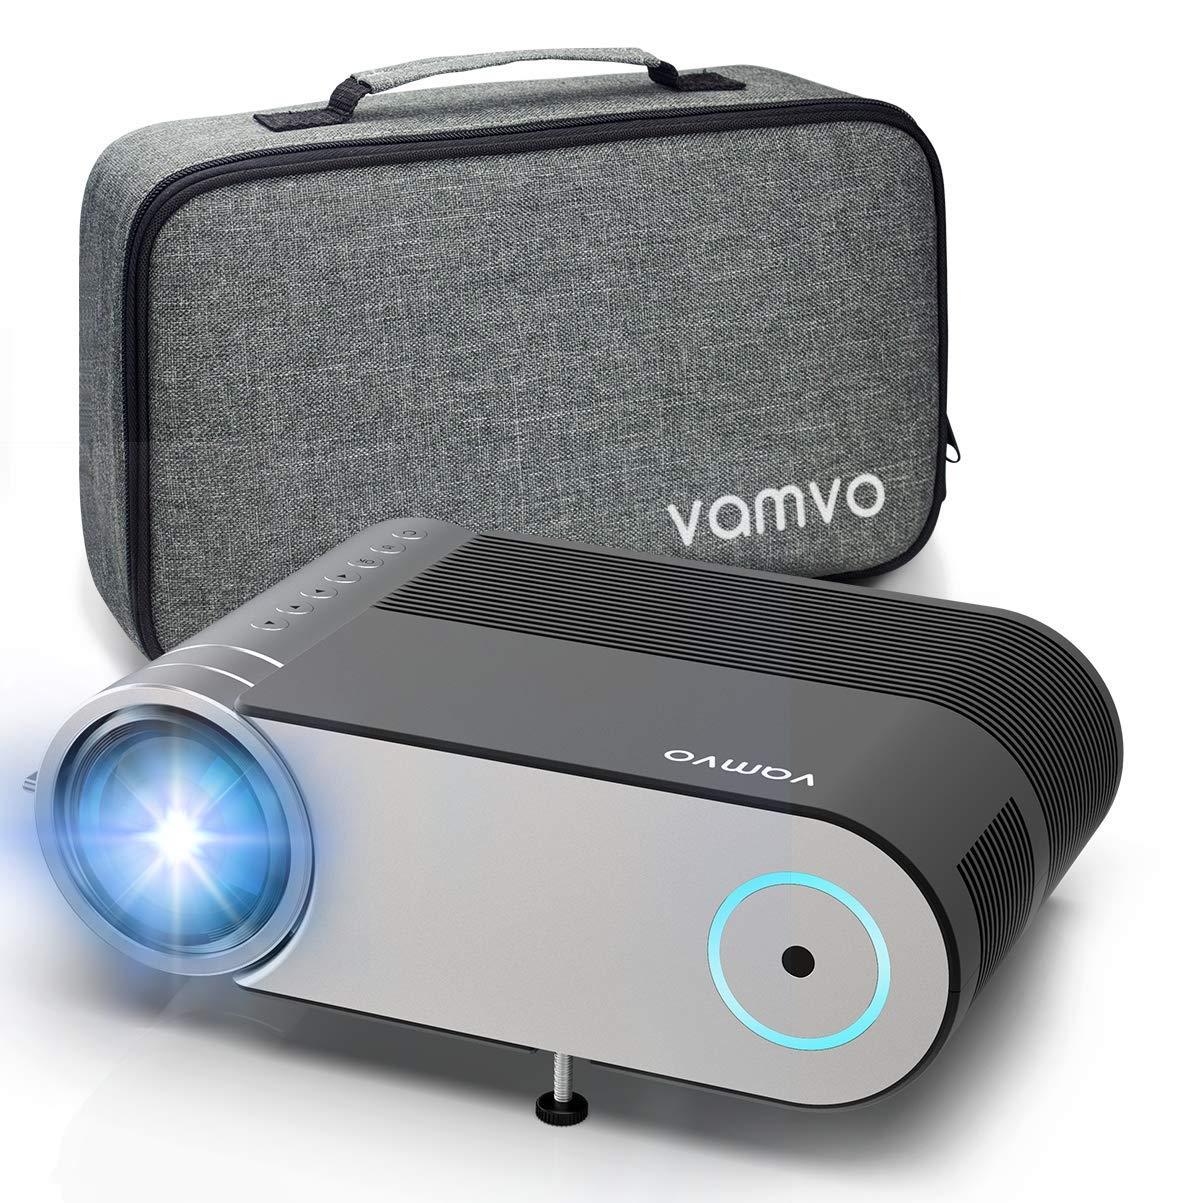 Proiettore, Vamvo Videoproiettore Portatile 1280x720p